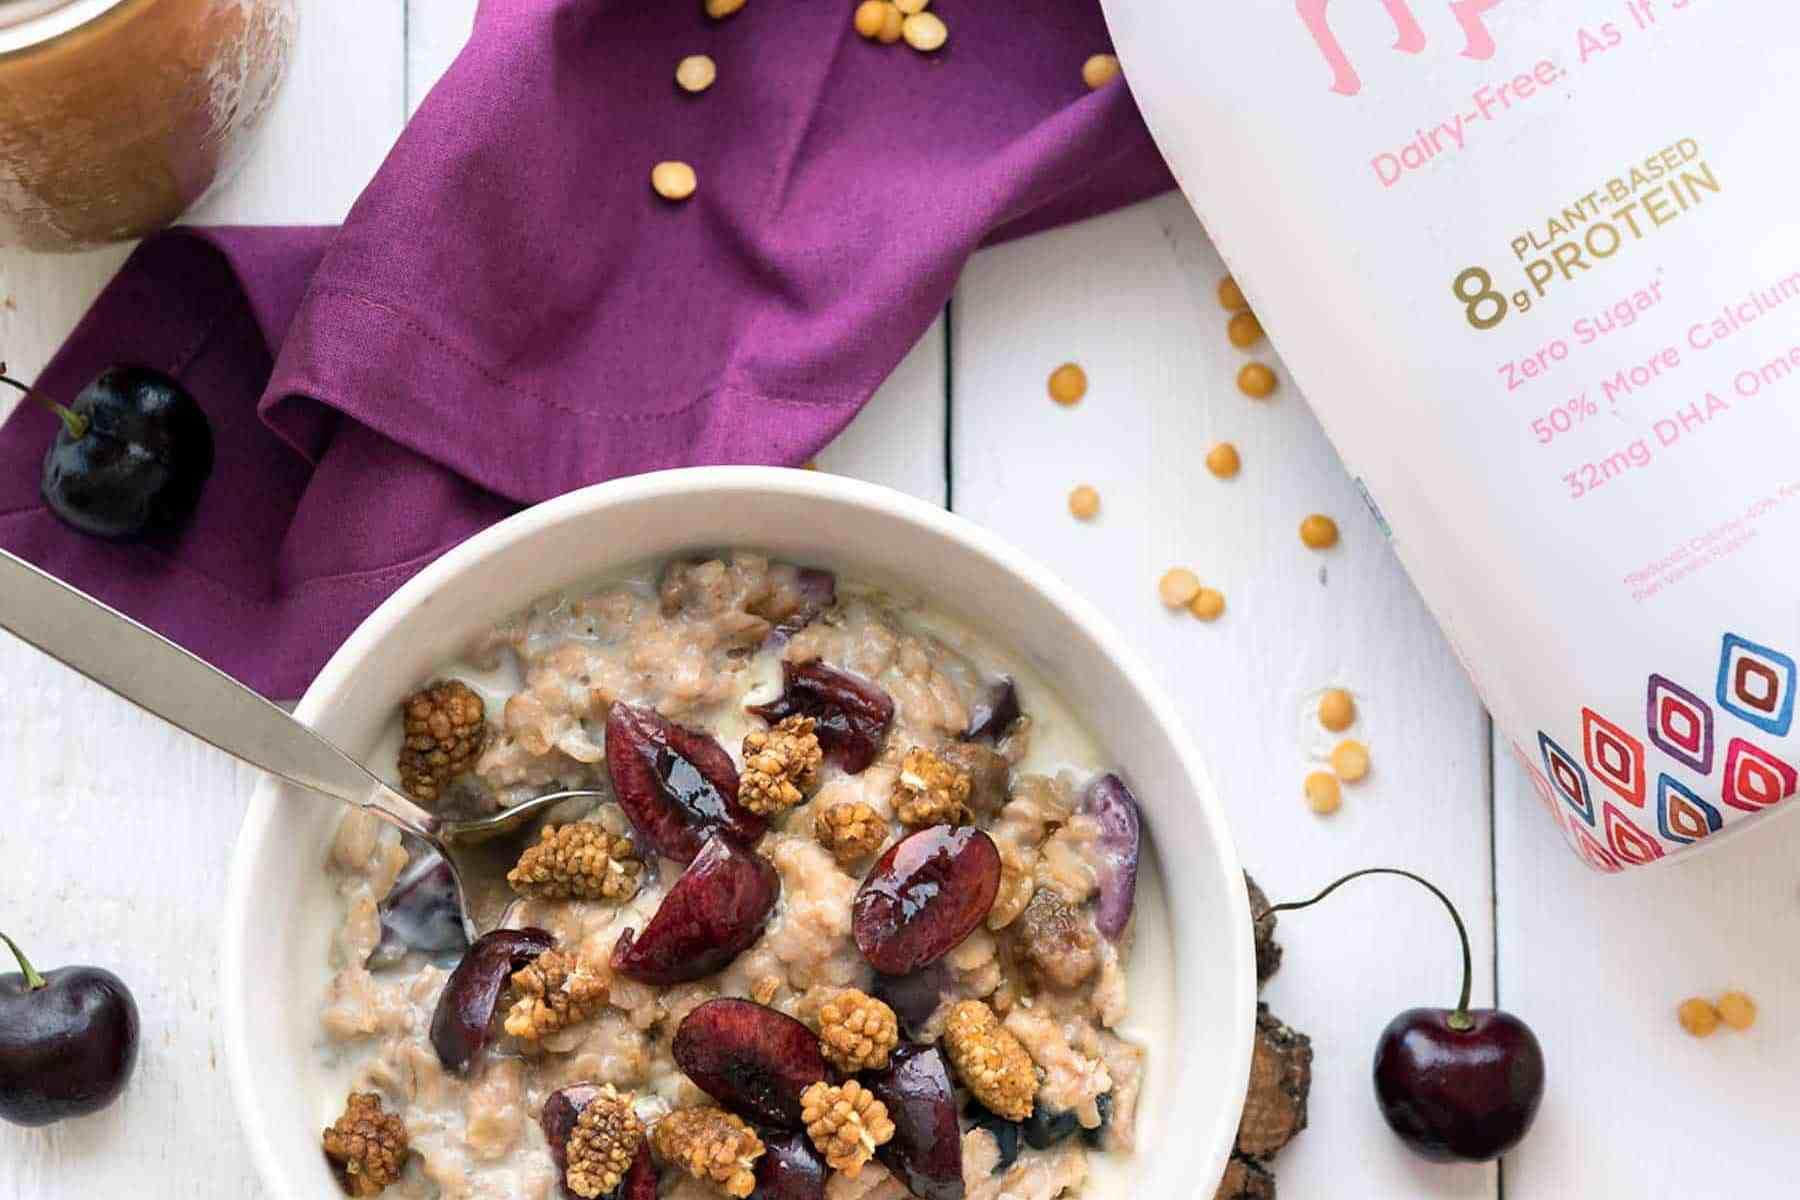 New Product Review! Unsweetened Vanilla Ripple Pea Milk - High in protein, zero sugar, and allergy-friendly! #vegan #soyfree #nutfree #ripplefoods #dairyfreedom